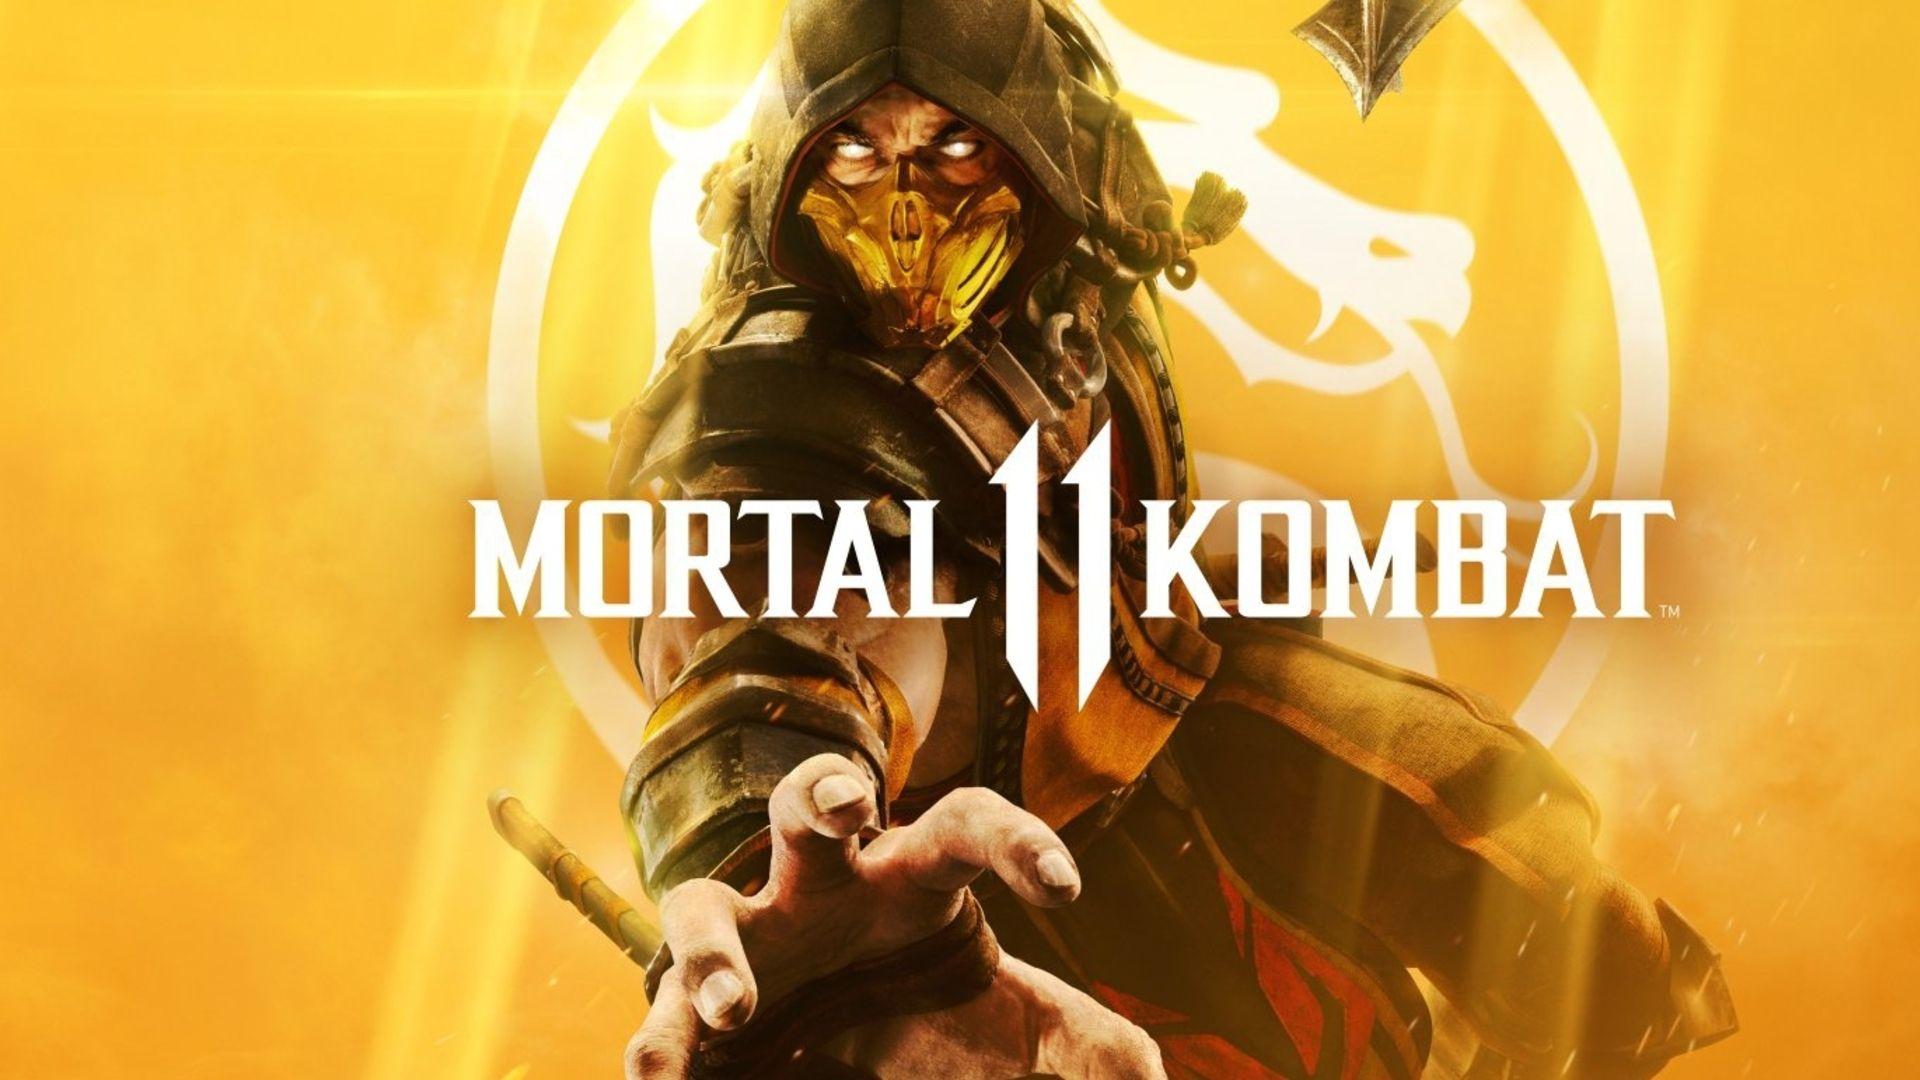 Johnny Cage treba dobiti Oscara za Mortal Kombat 11 fatality